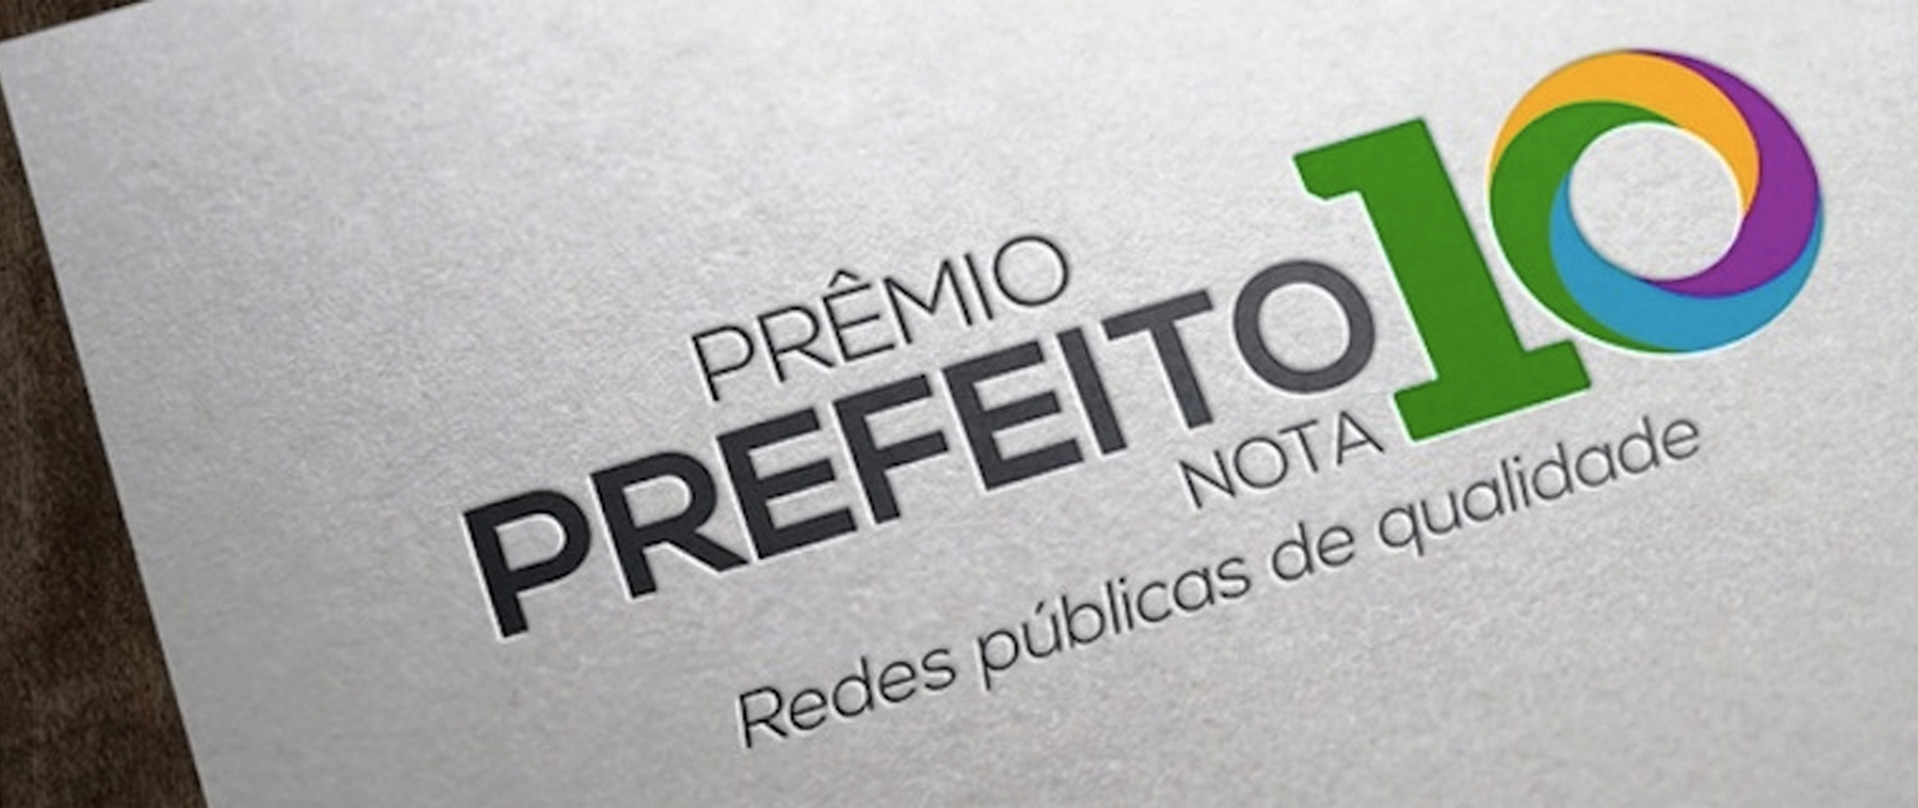 Prêmio Prefeito Nota 10